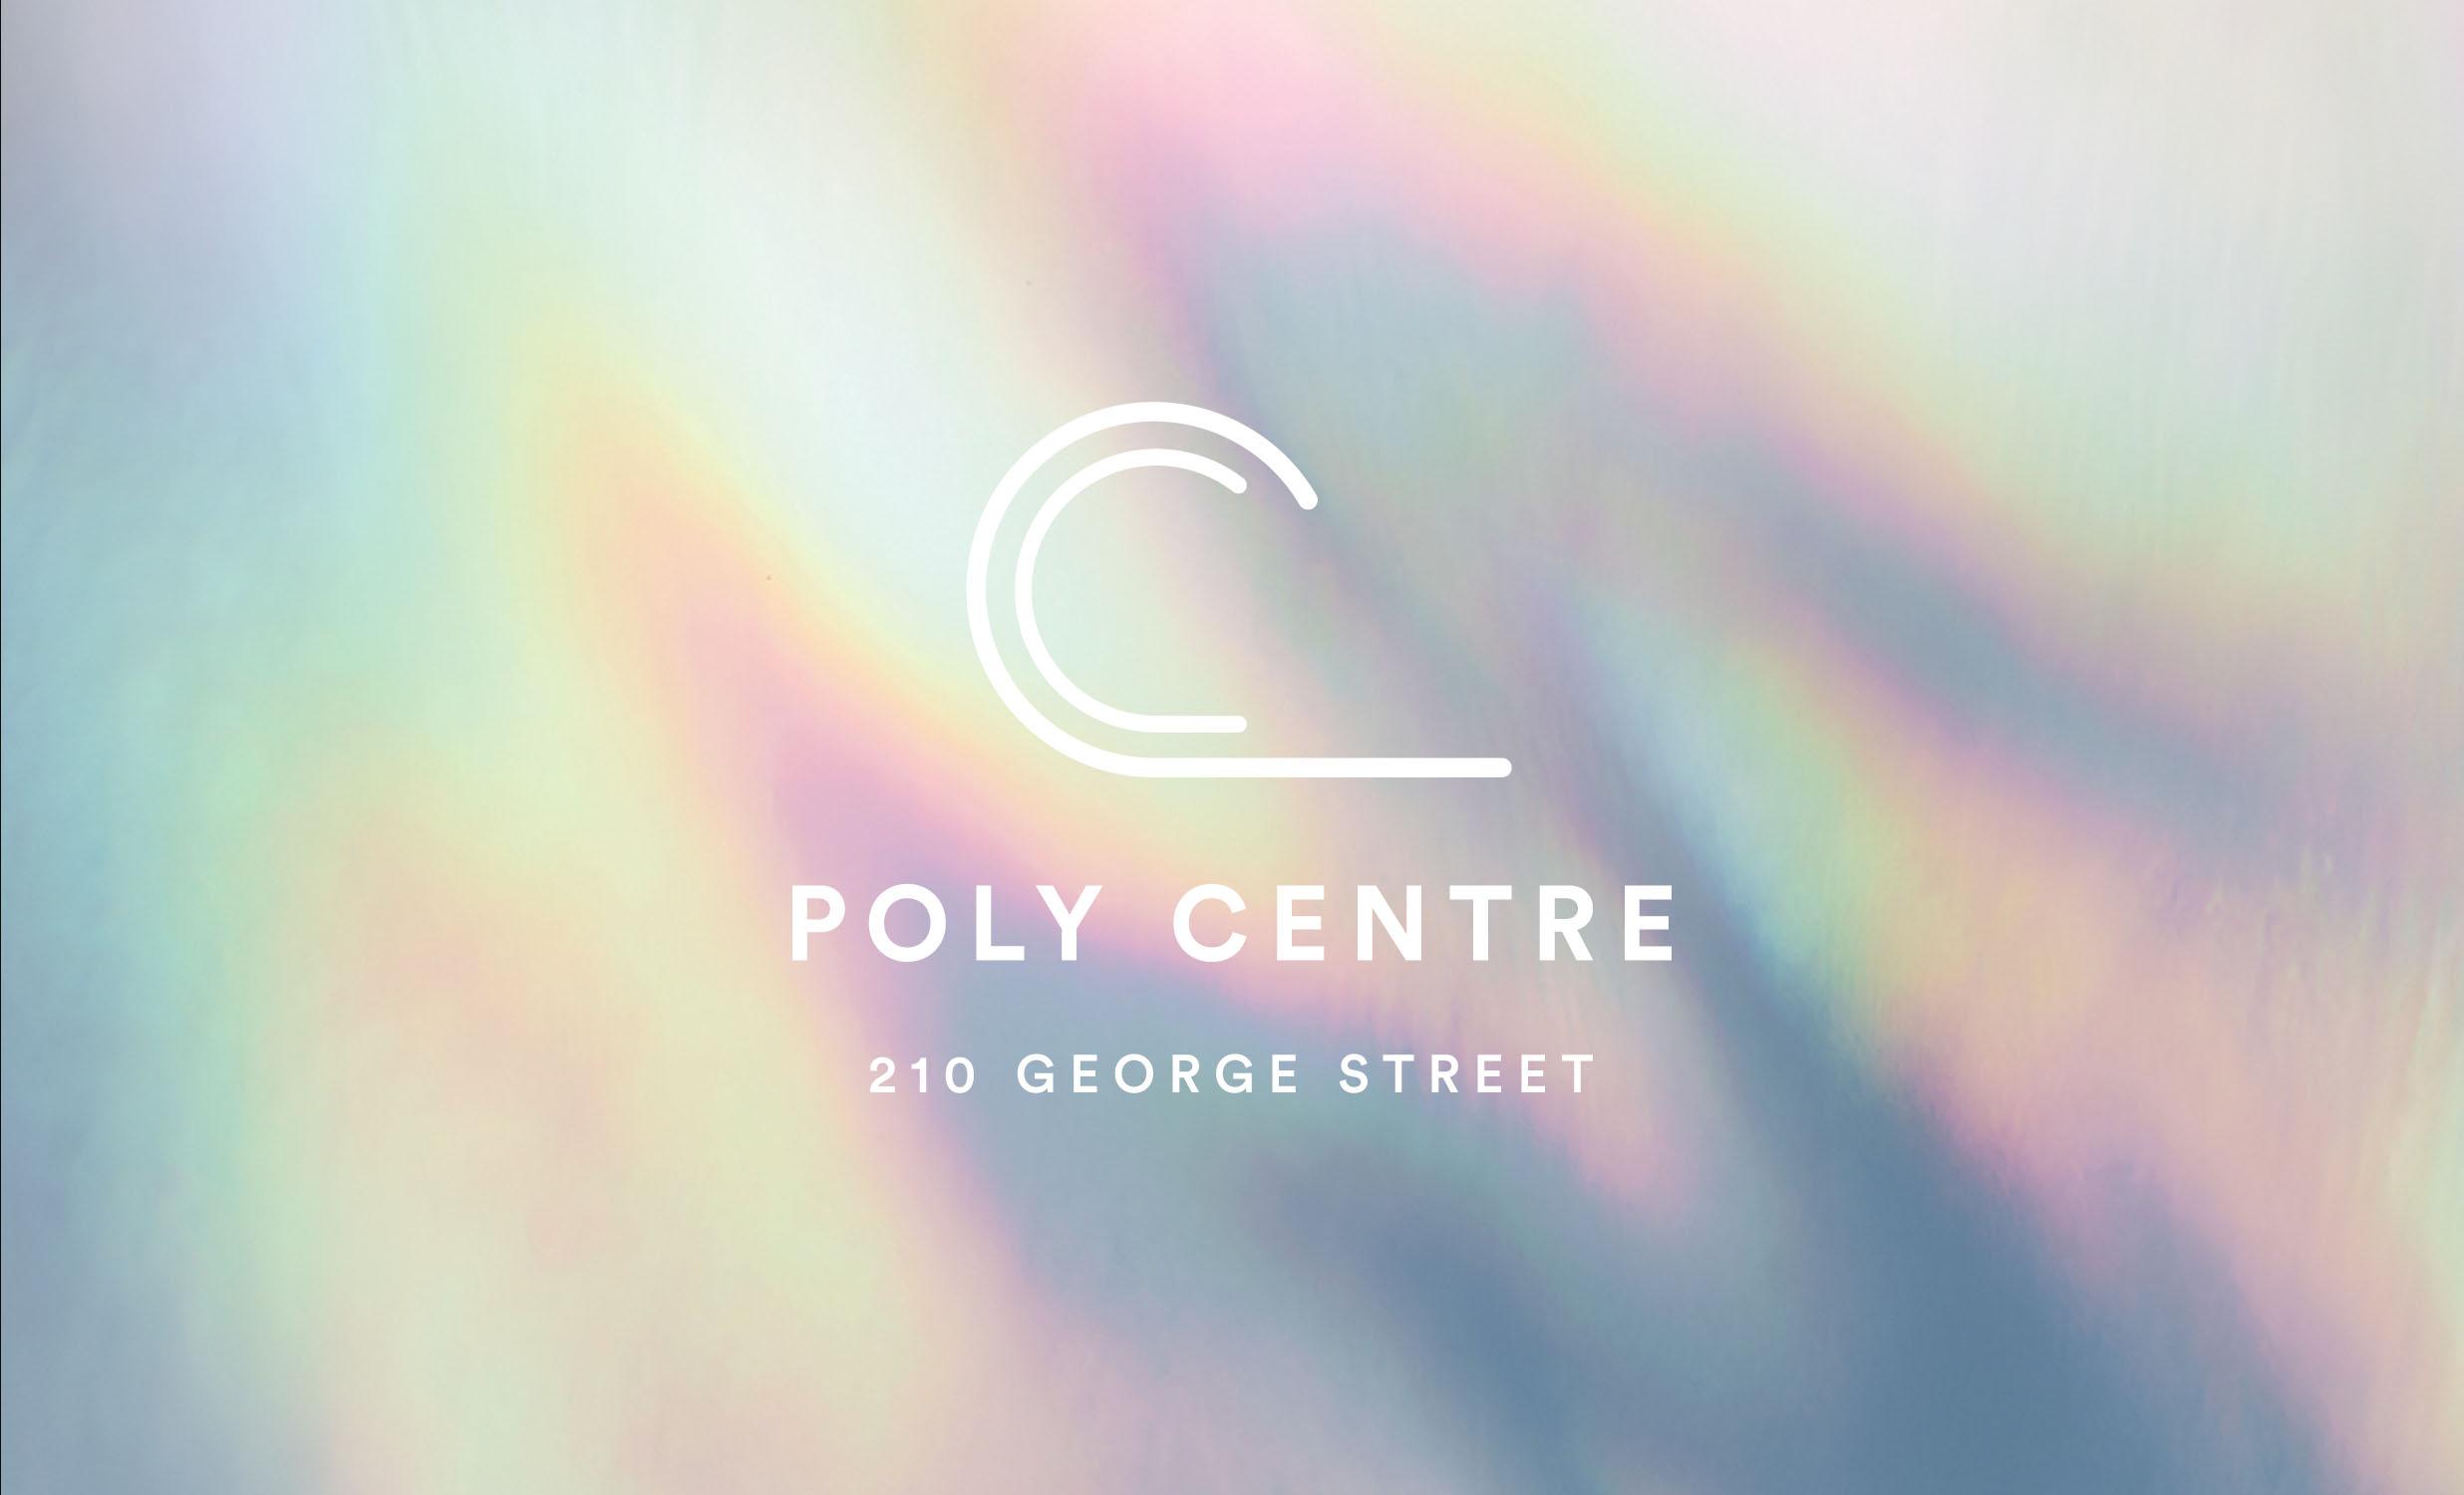 DS Poly Centre 2472x1500px 02-thumb LR.jpg